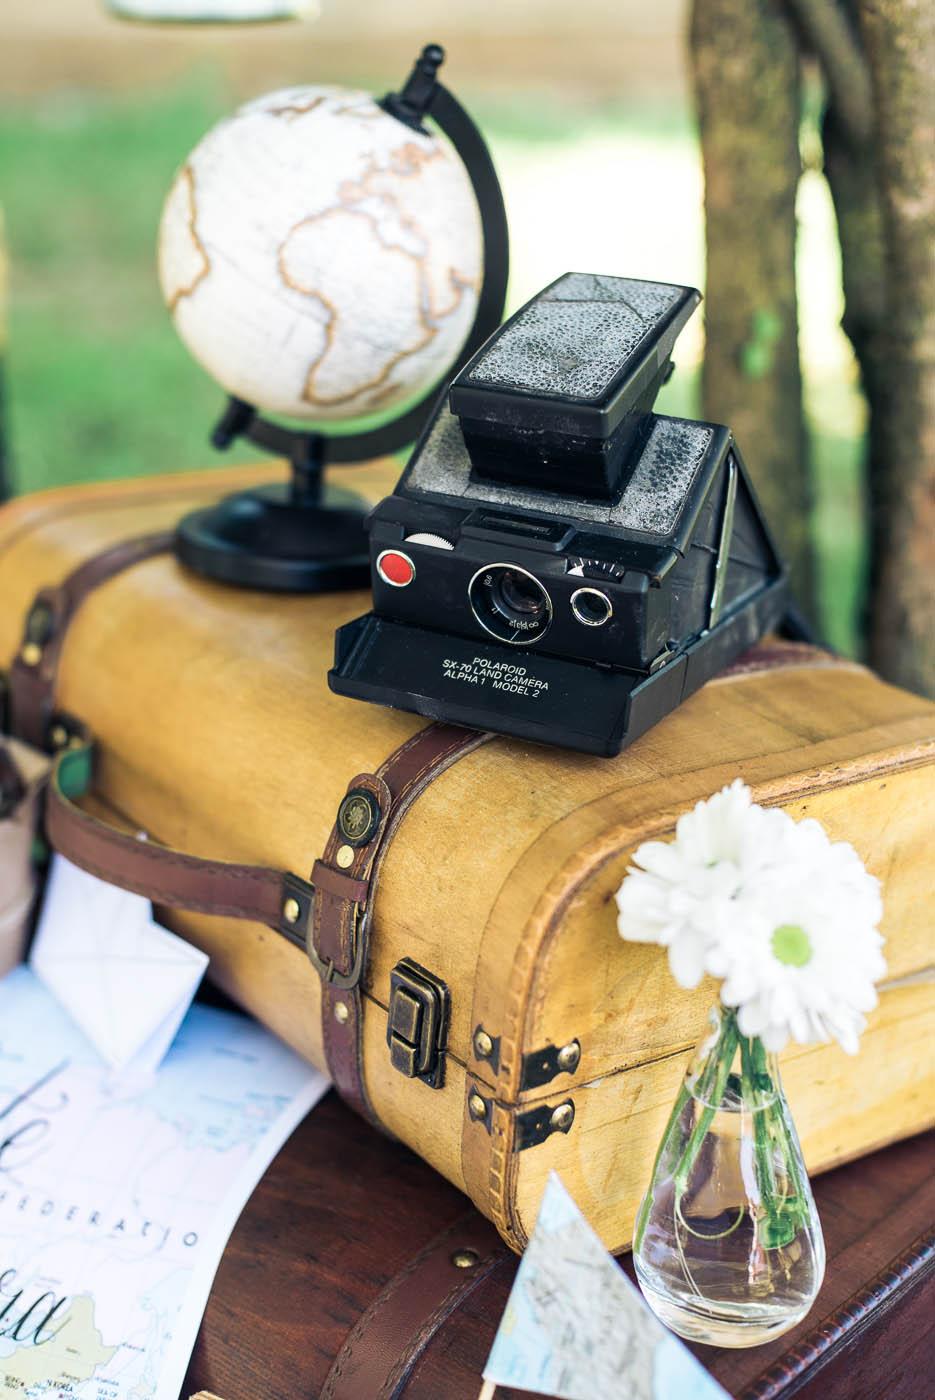 allestimento a tema viaggi con valigia e macchina fotografica vintage